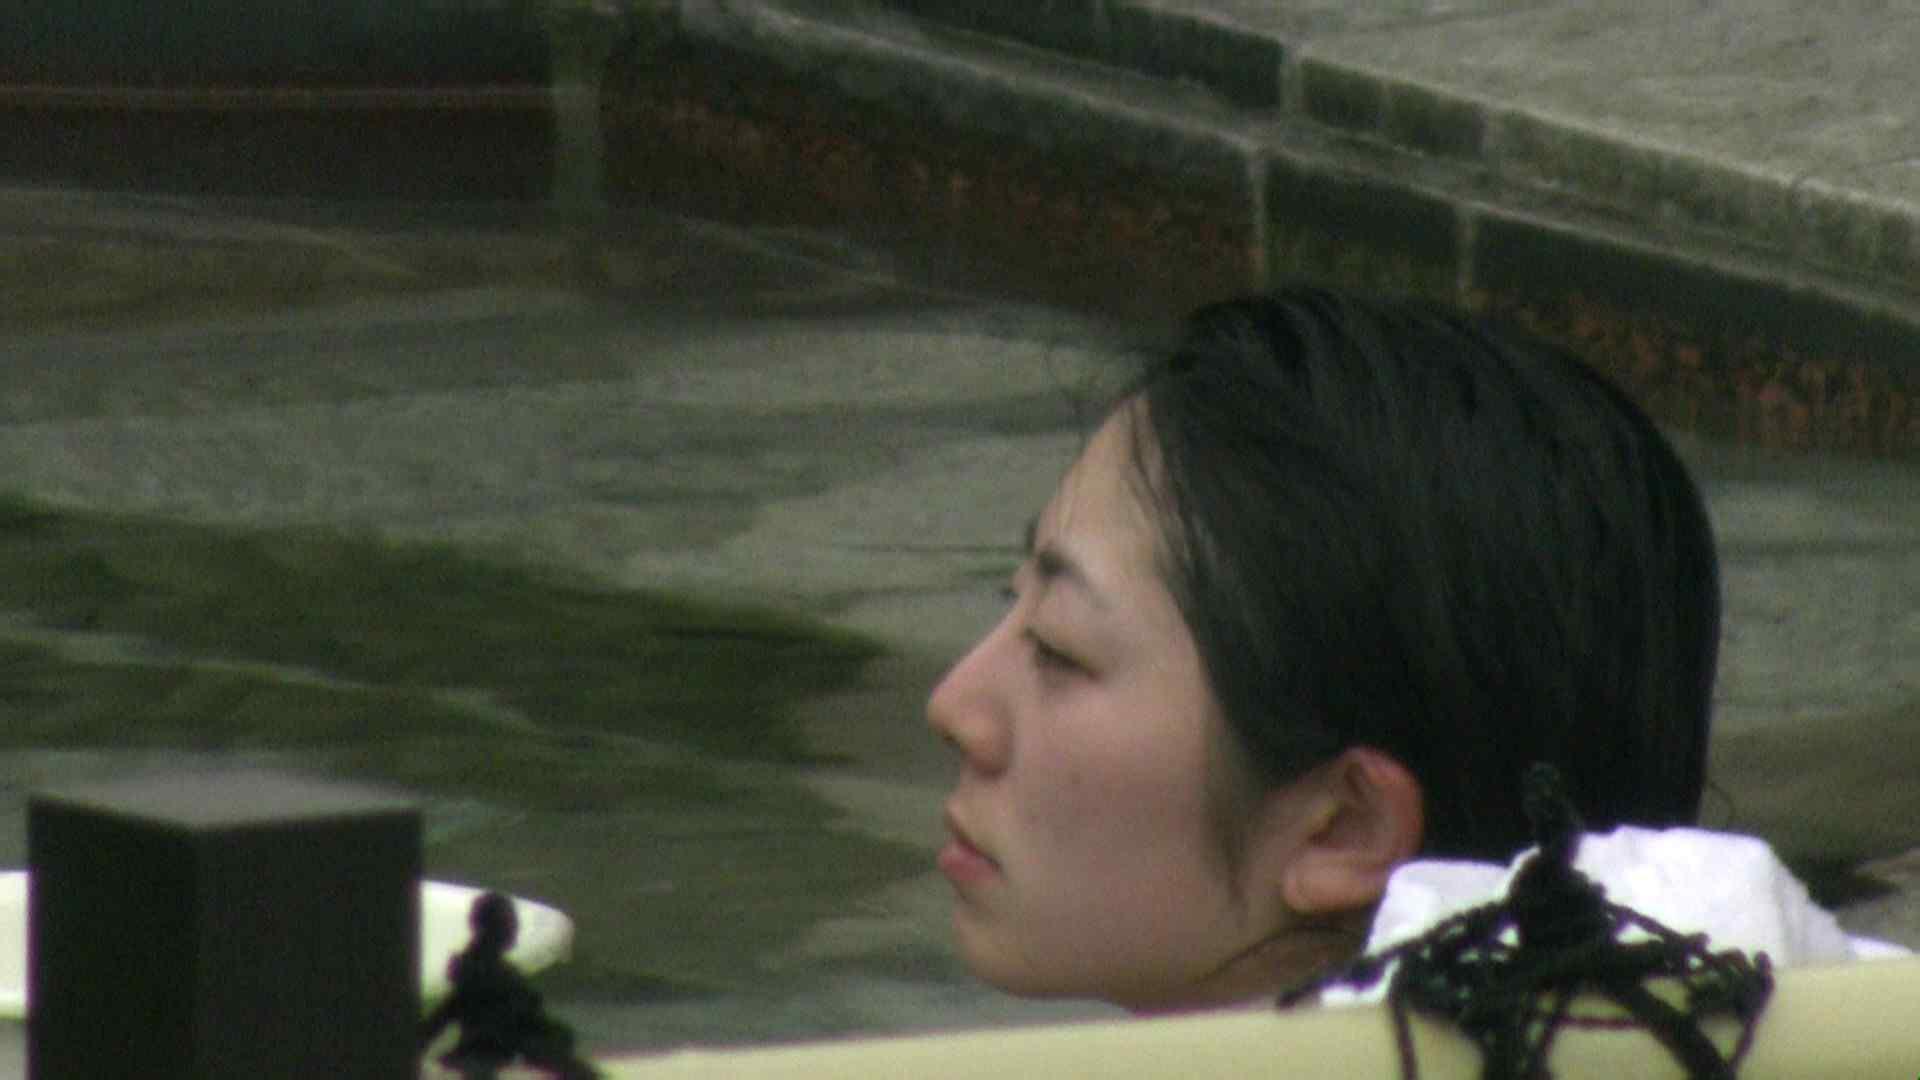 Aquaな露天風呂Vol.04 露天風呂編 | 盗撮シリーズ  94PIX 13